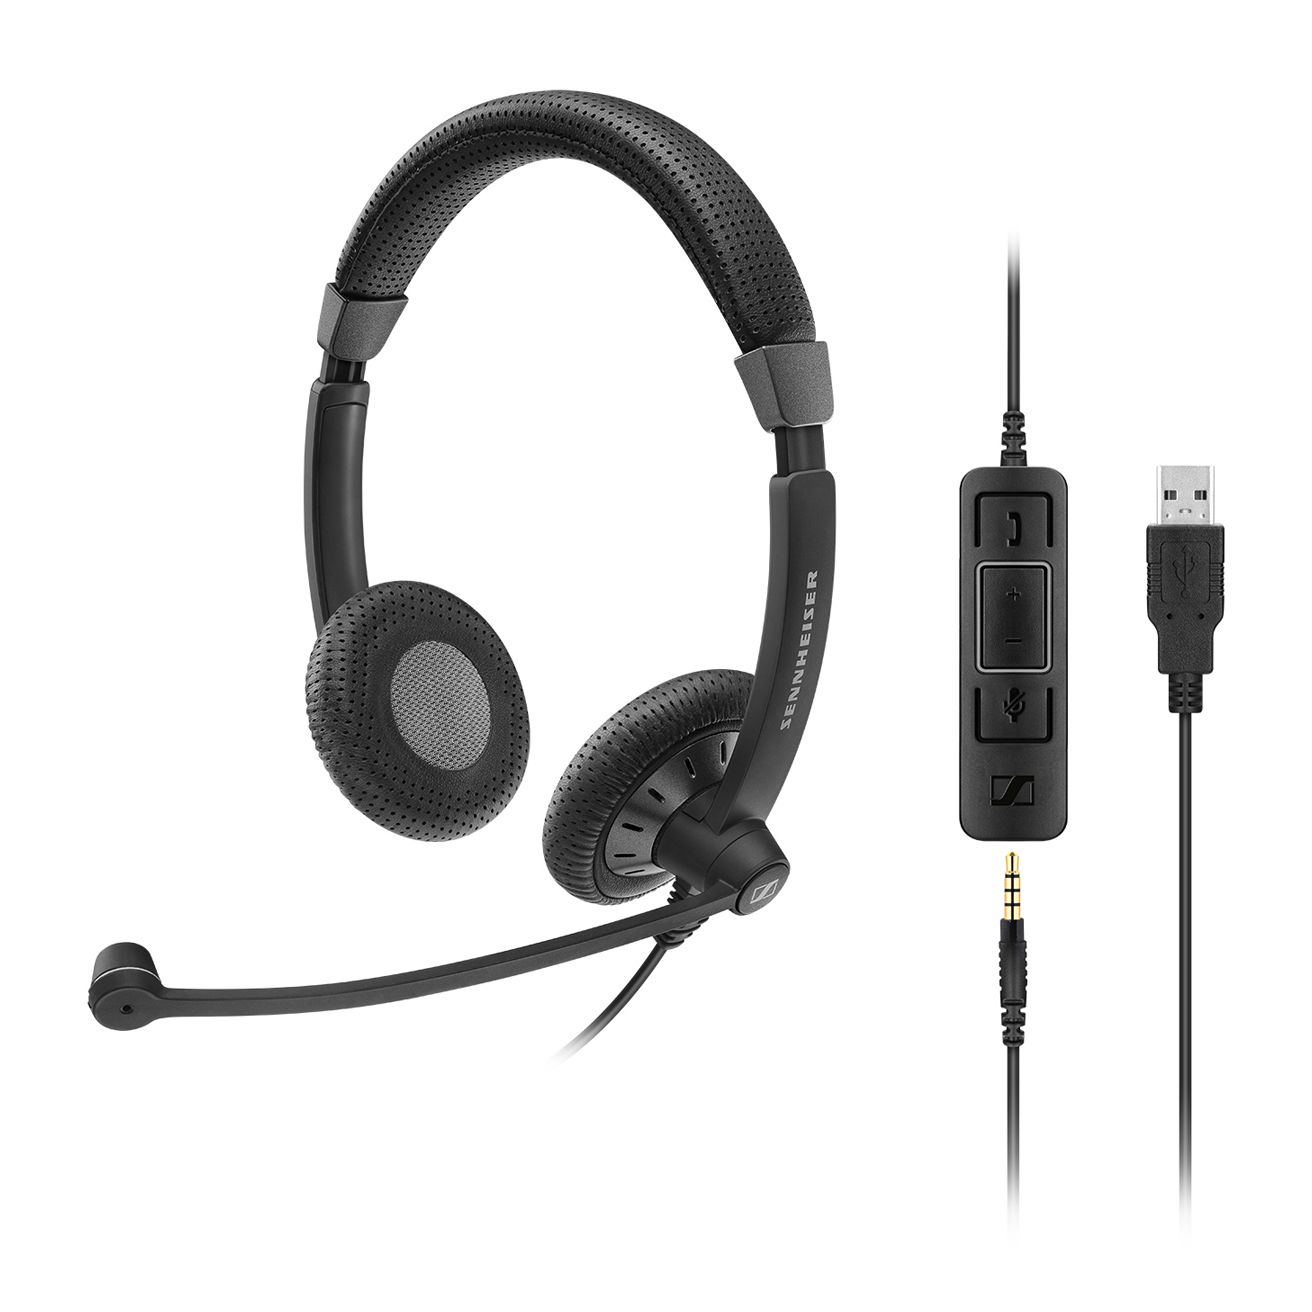 Sennheiser SC 75 USB CTRL Binaural Head-band Black headset